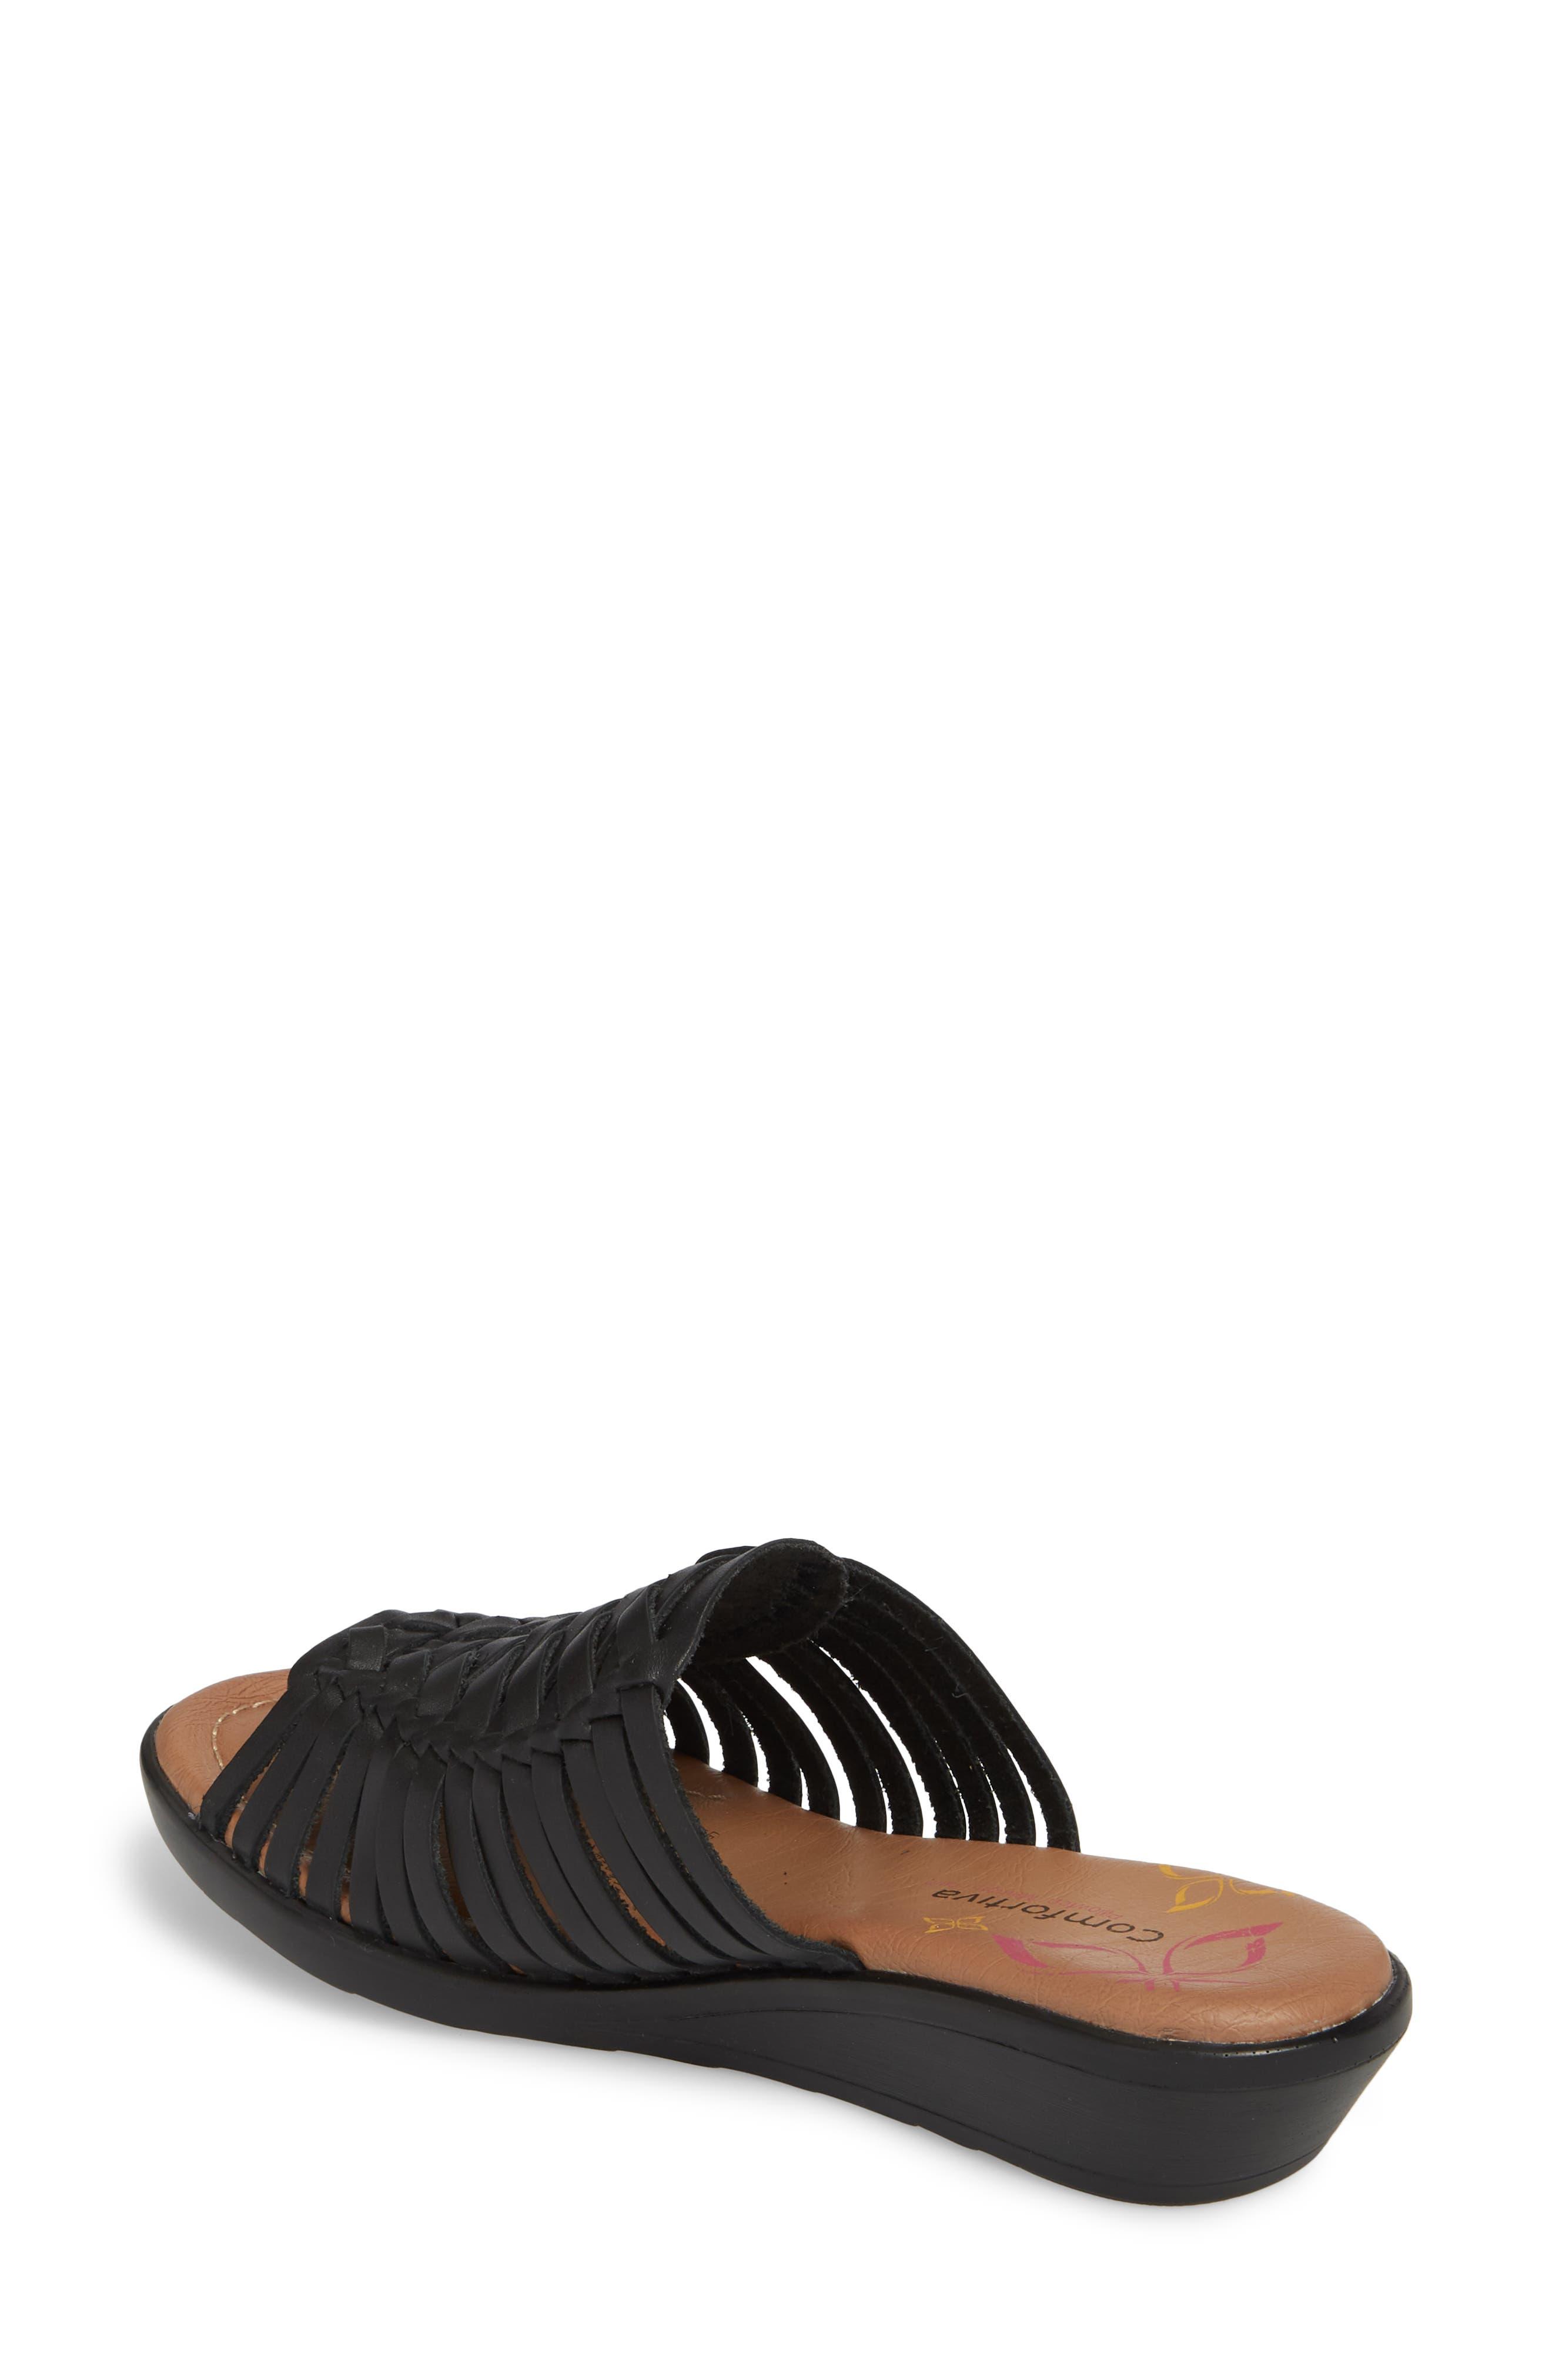 COMFORTIVA, Felida Huarache Slide Sandal, Alternate thumbnail 2, color, BLACK LEATHER